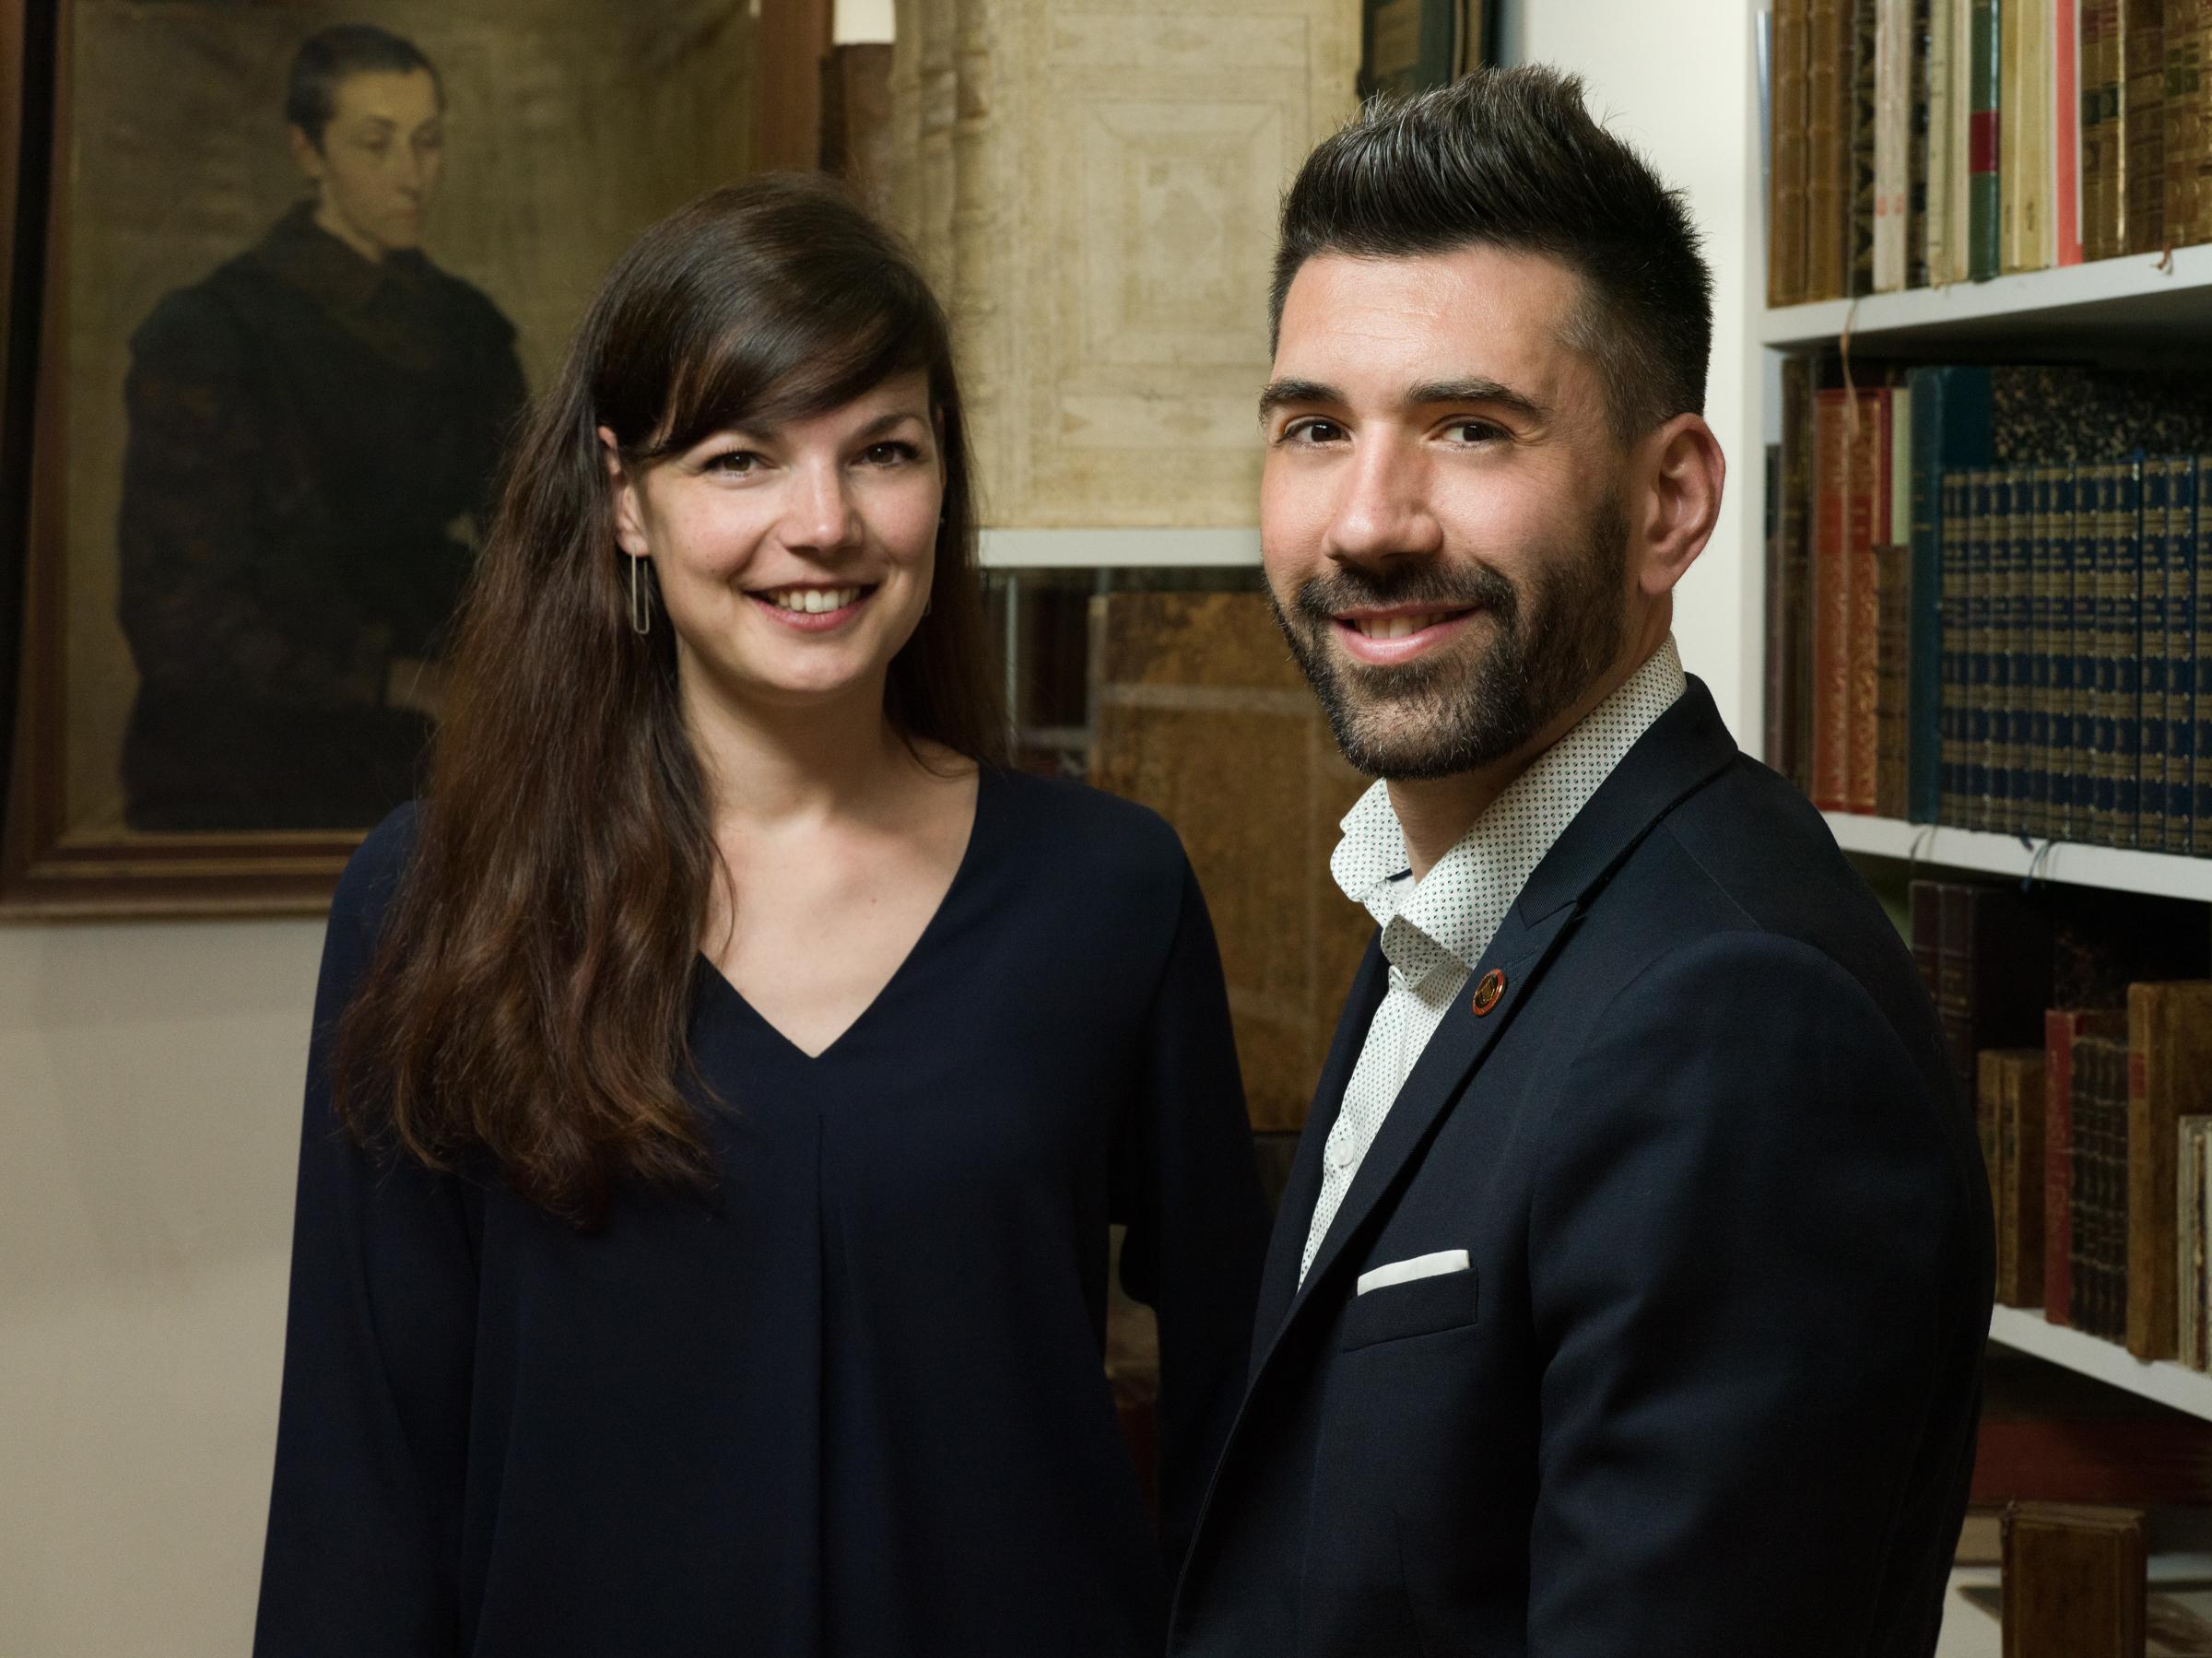 Martin Matrat, Cécile Fischer